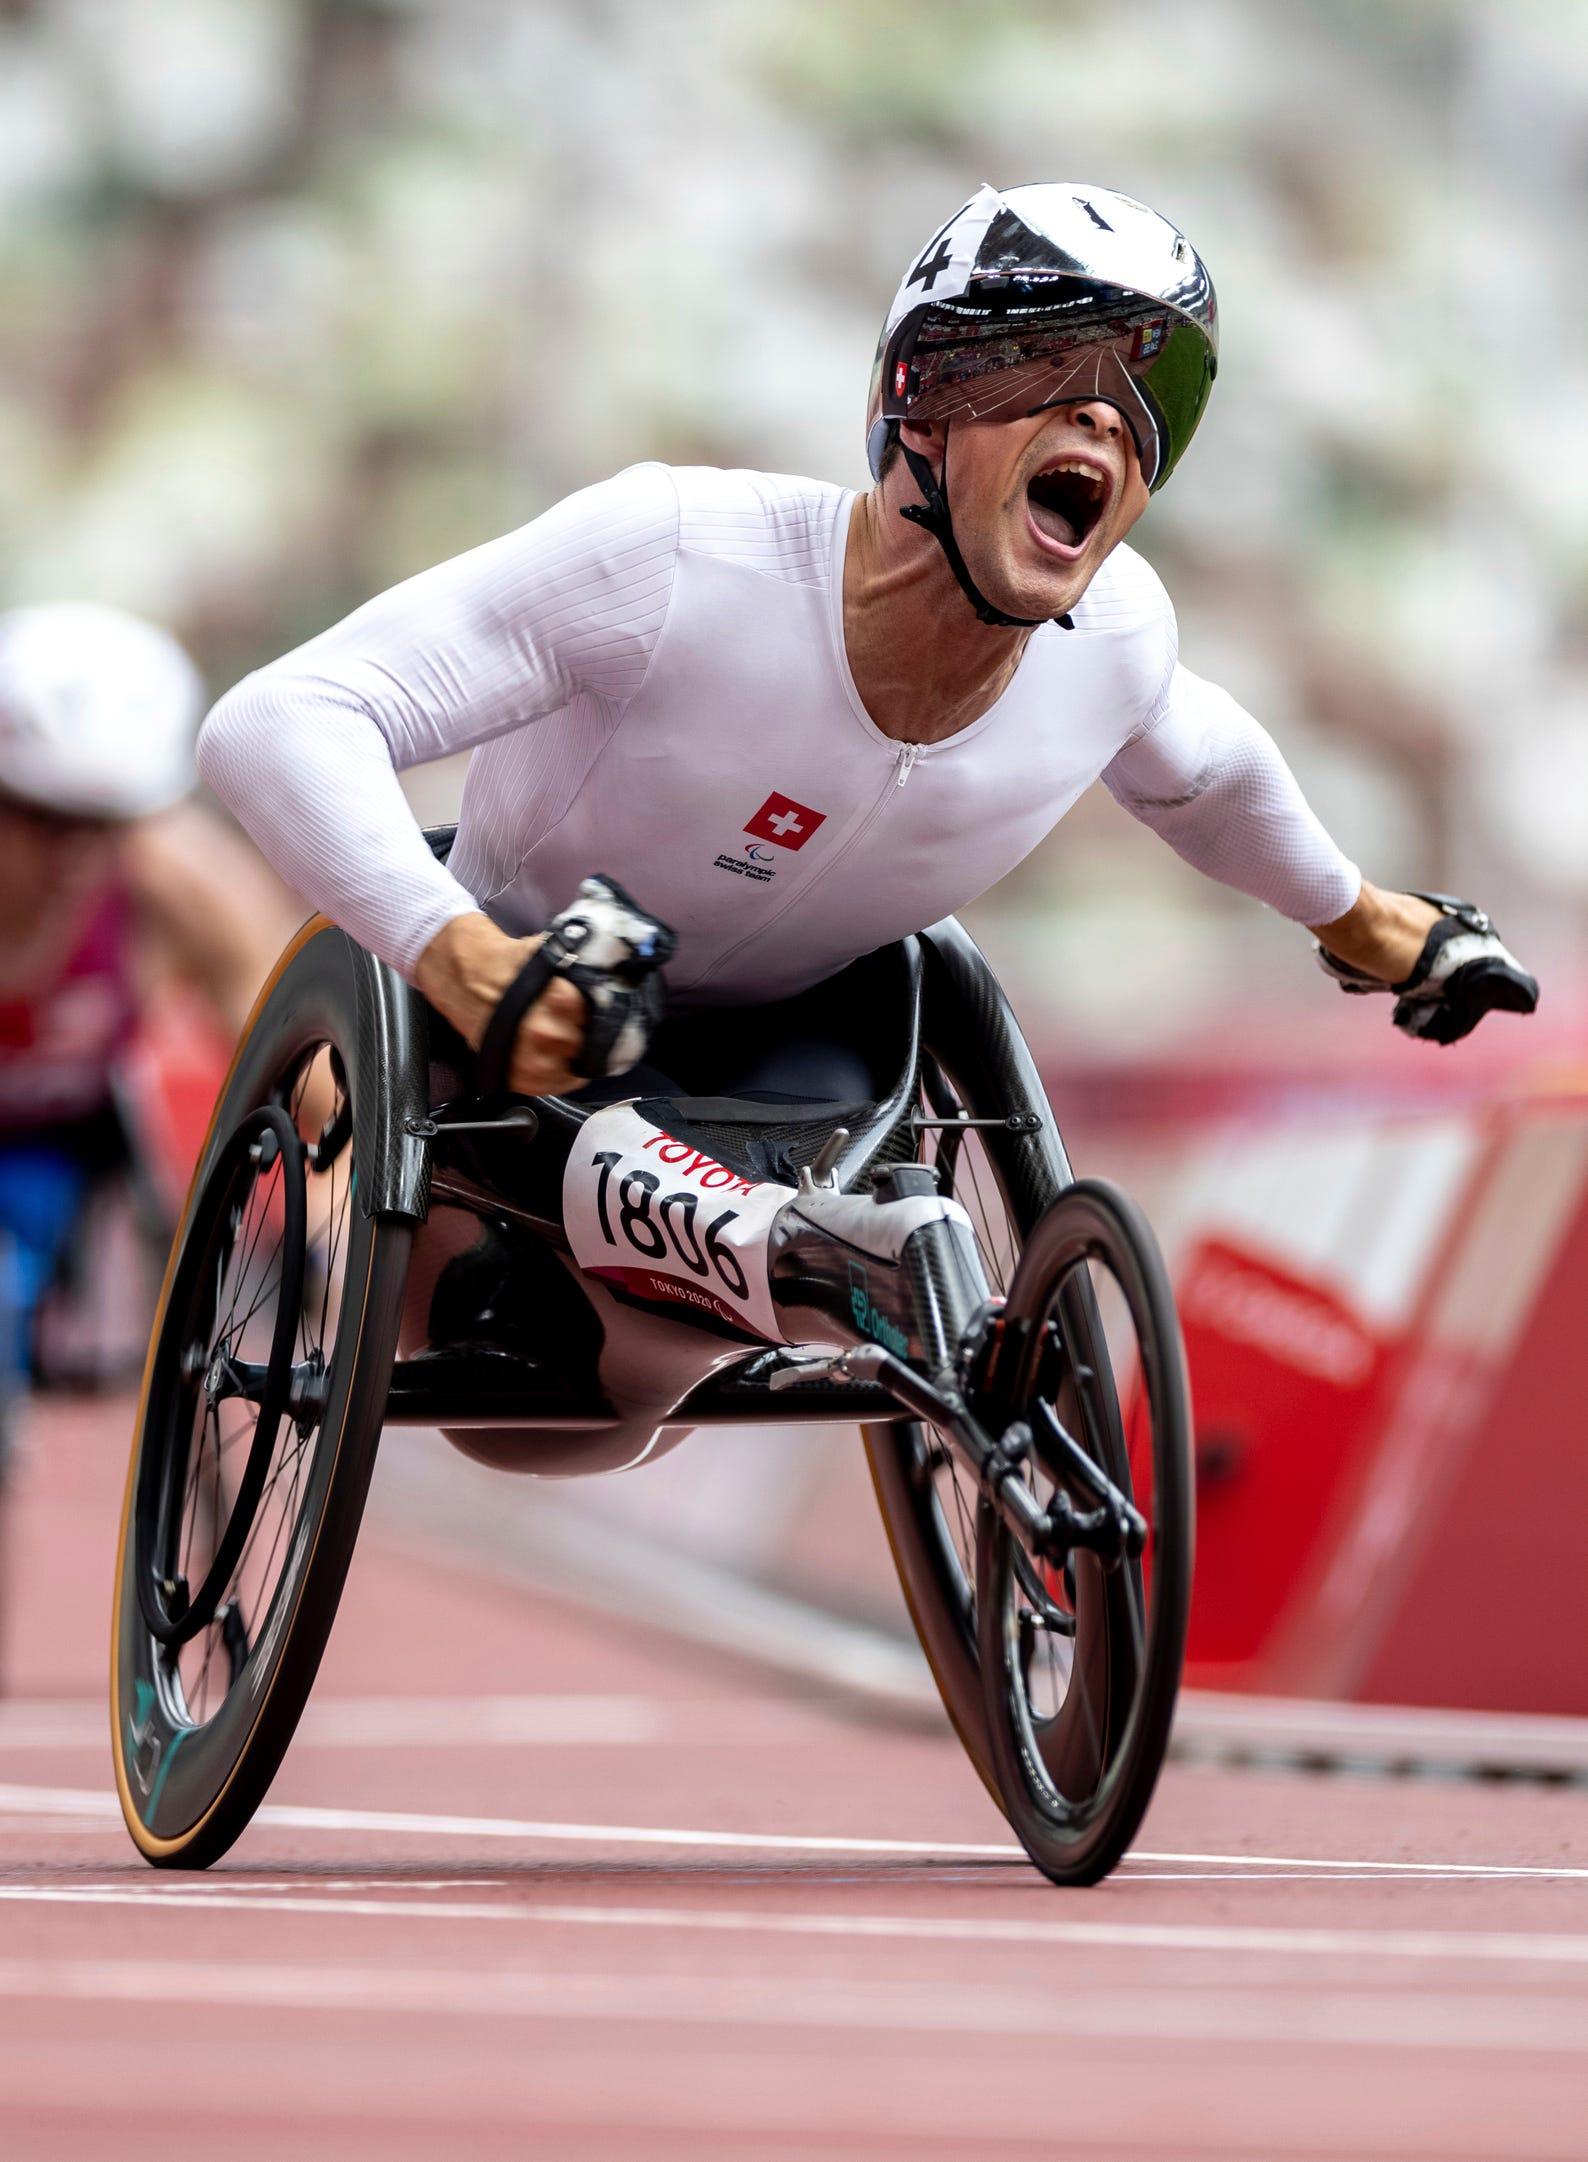 Aug. 31, 2021: Marcel Hug of Switzerland celebrates his gold medal finish in the Men's 1500-meter T54 Athletics Final.